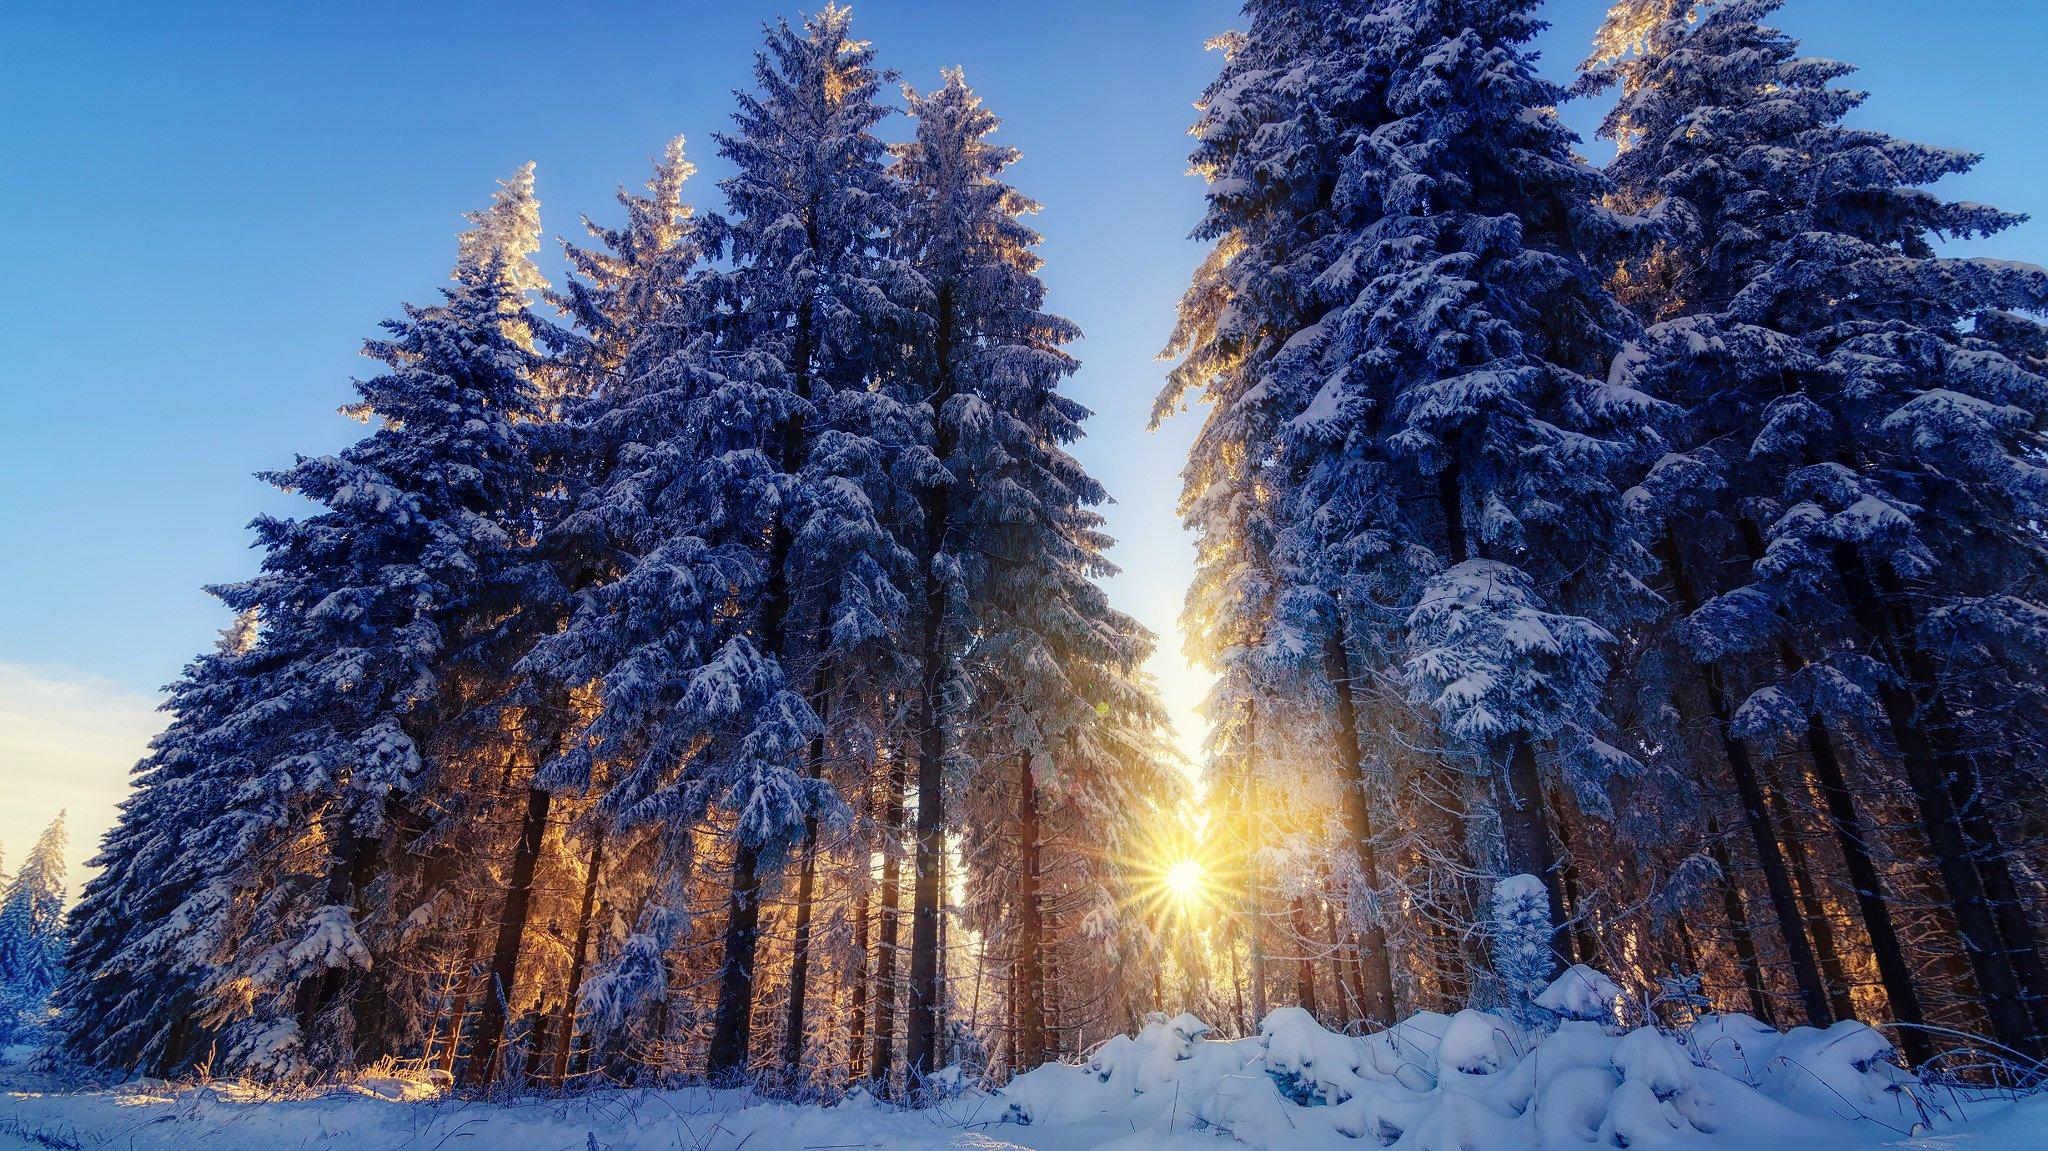 снег зима лучи деревья snow winter rays trees бесплатно